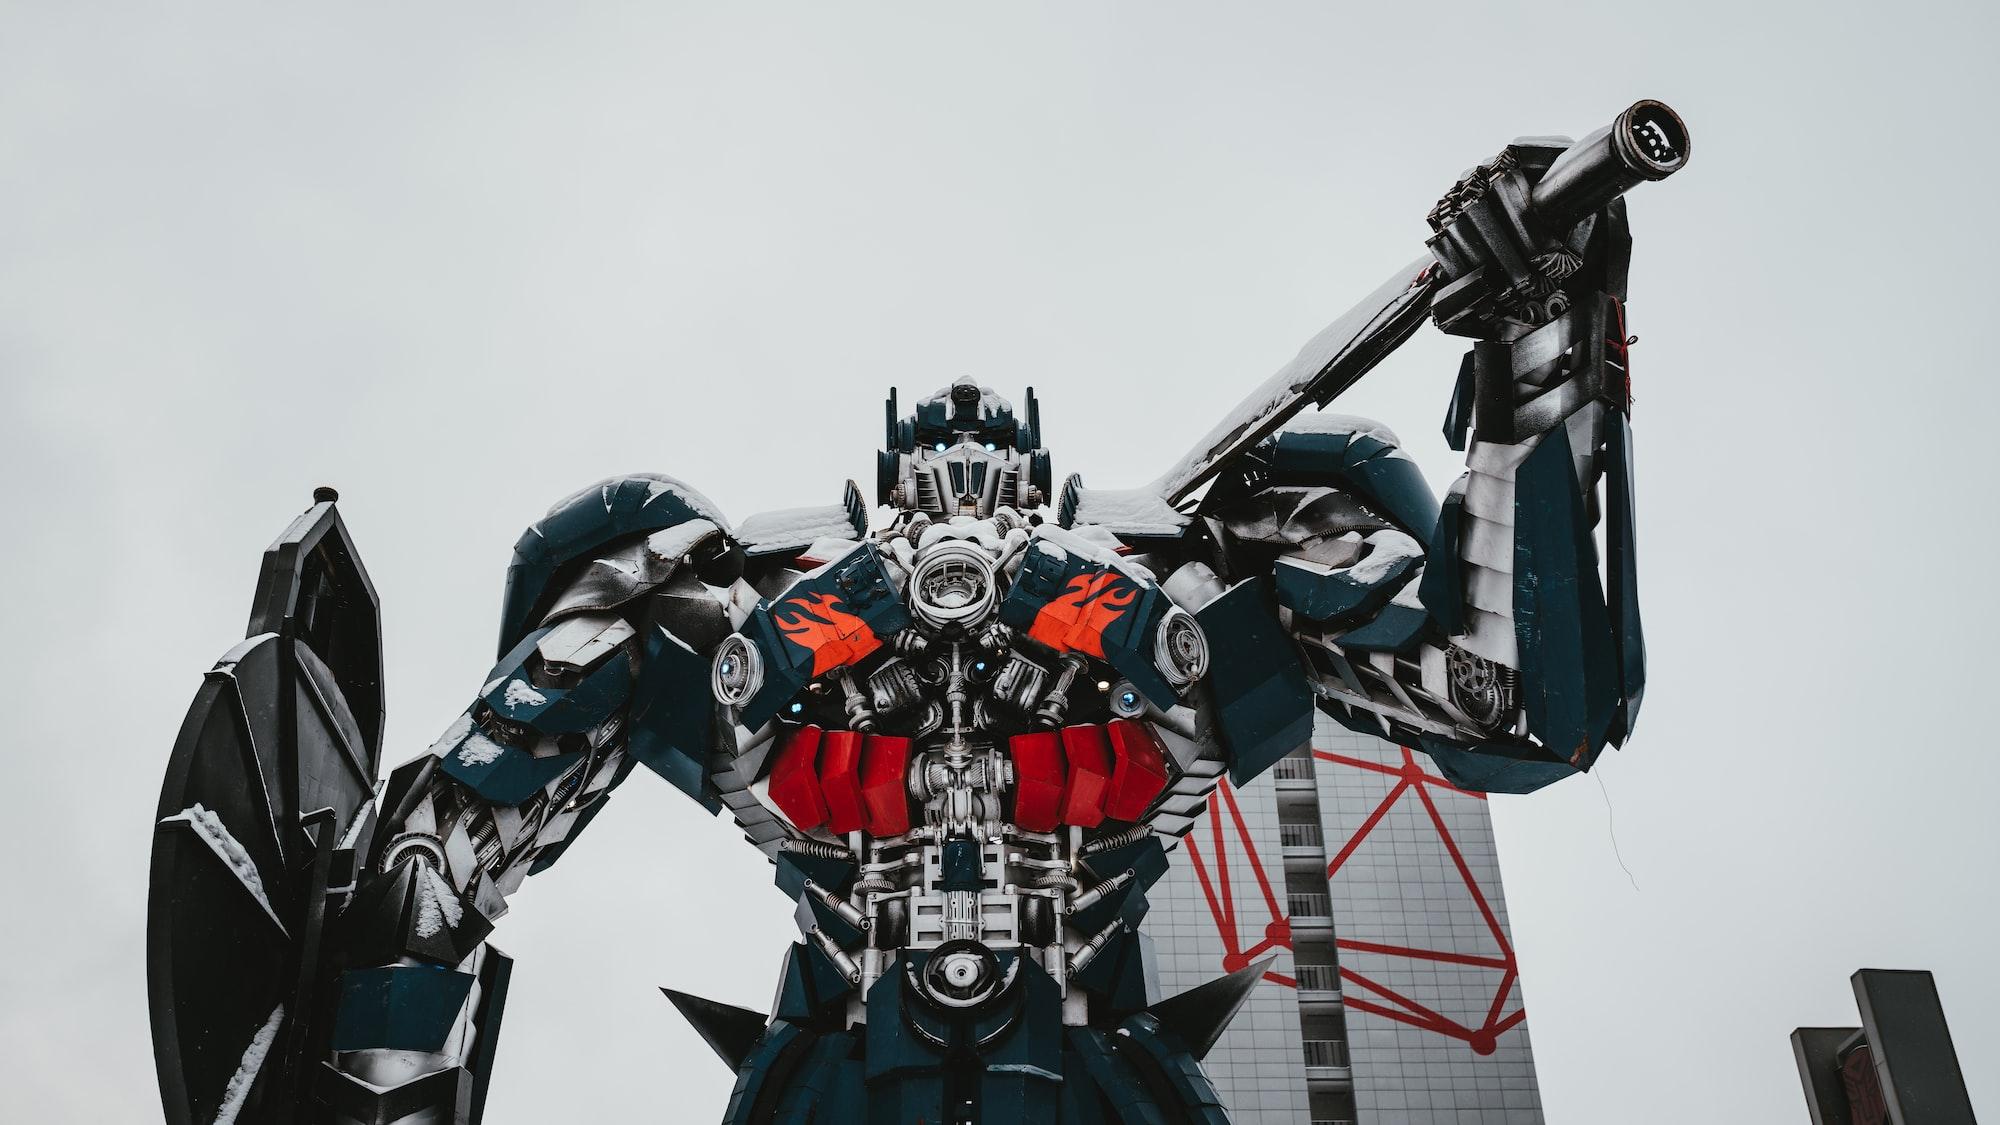 Week 25 - NLP의 옵티머스 프라임, Transformer 등장!